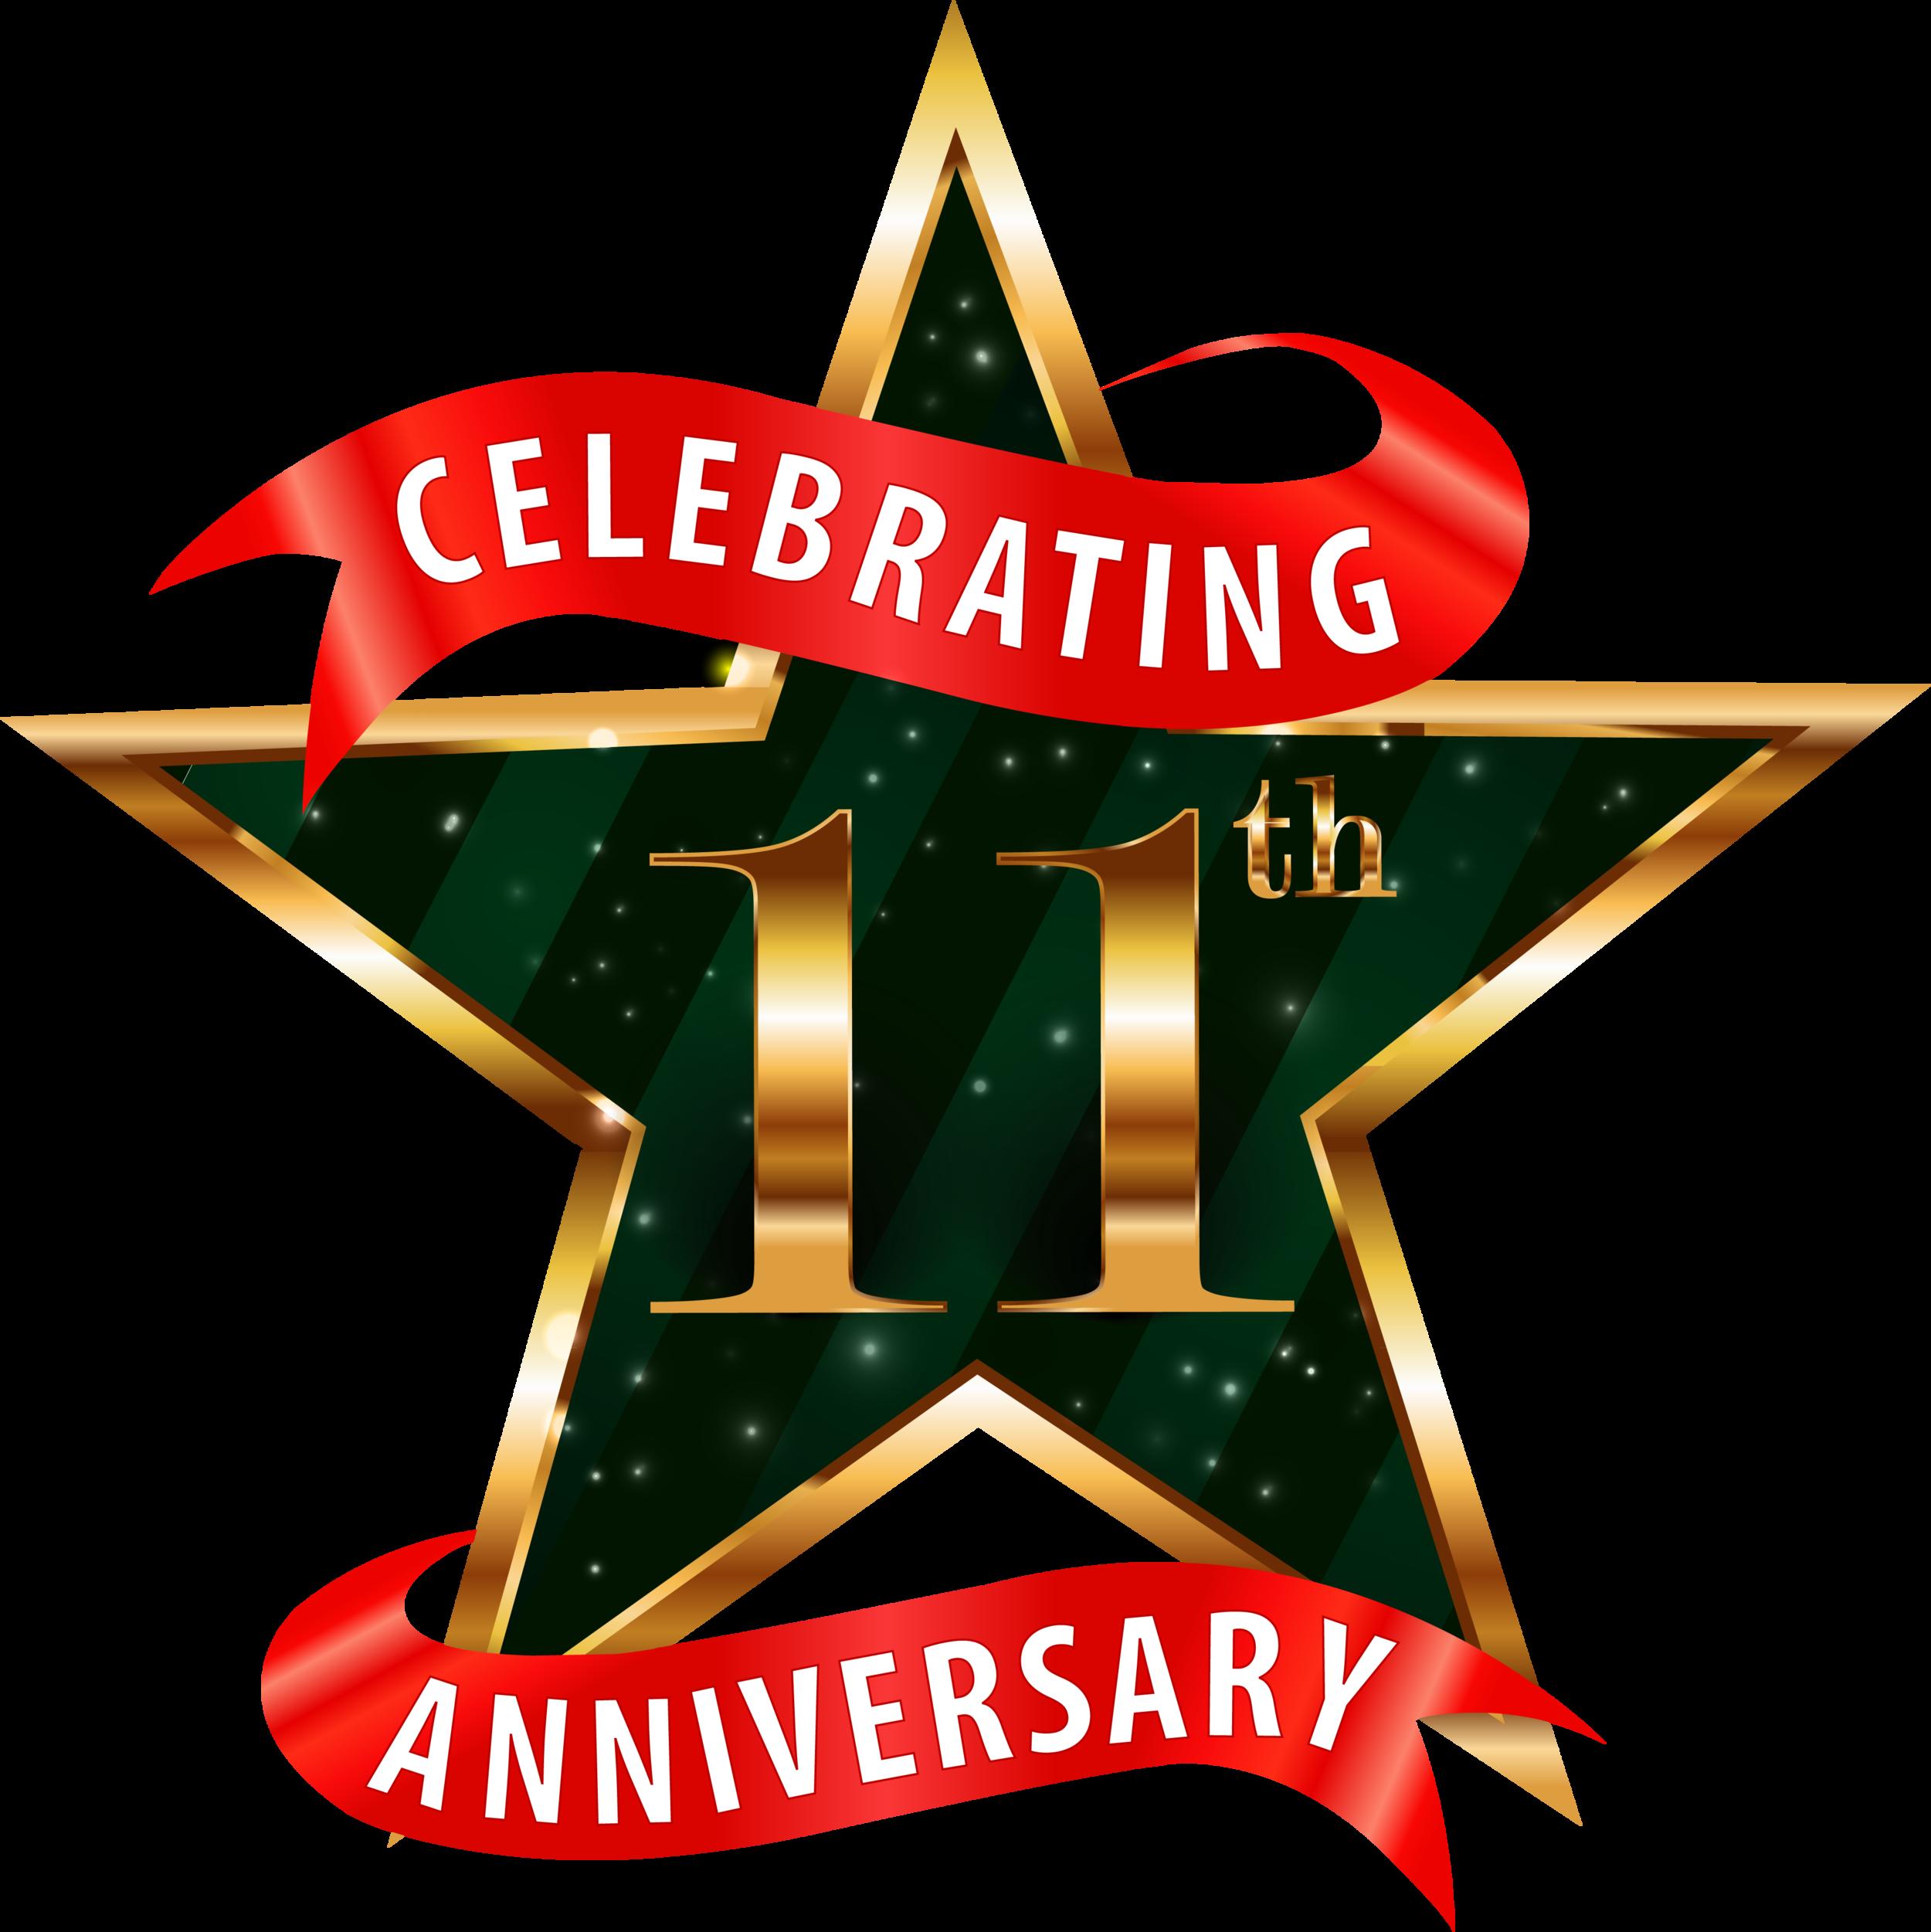 Pastor Anniversary Clipart Wwwtopsimagescom